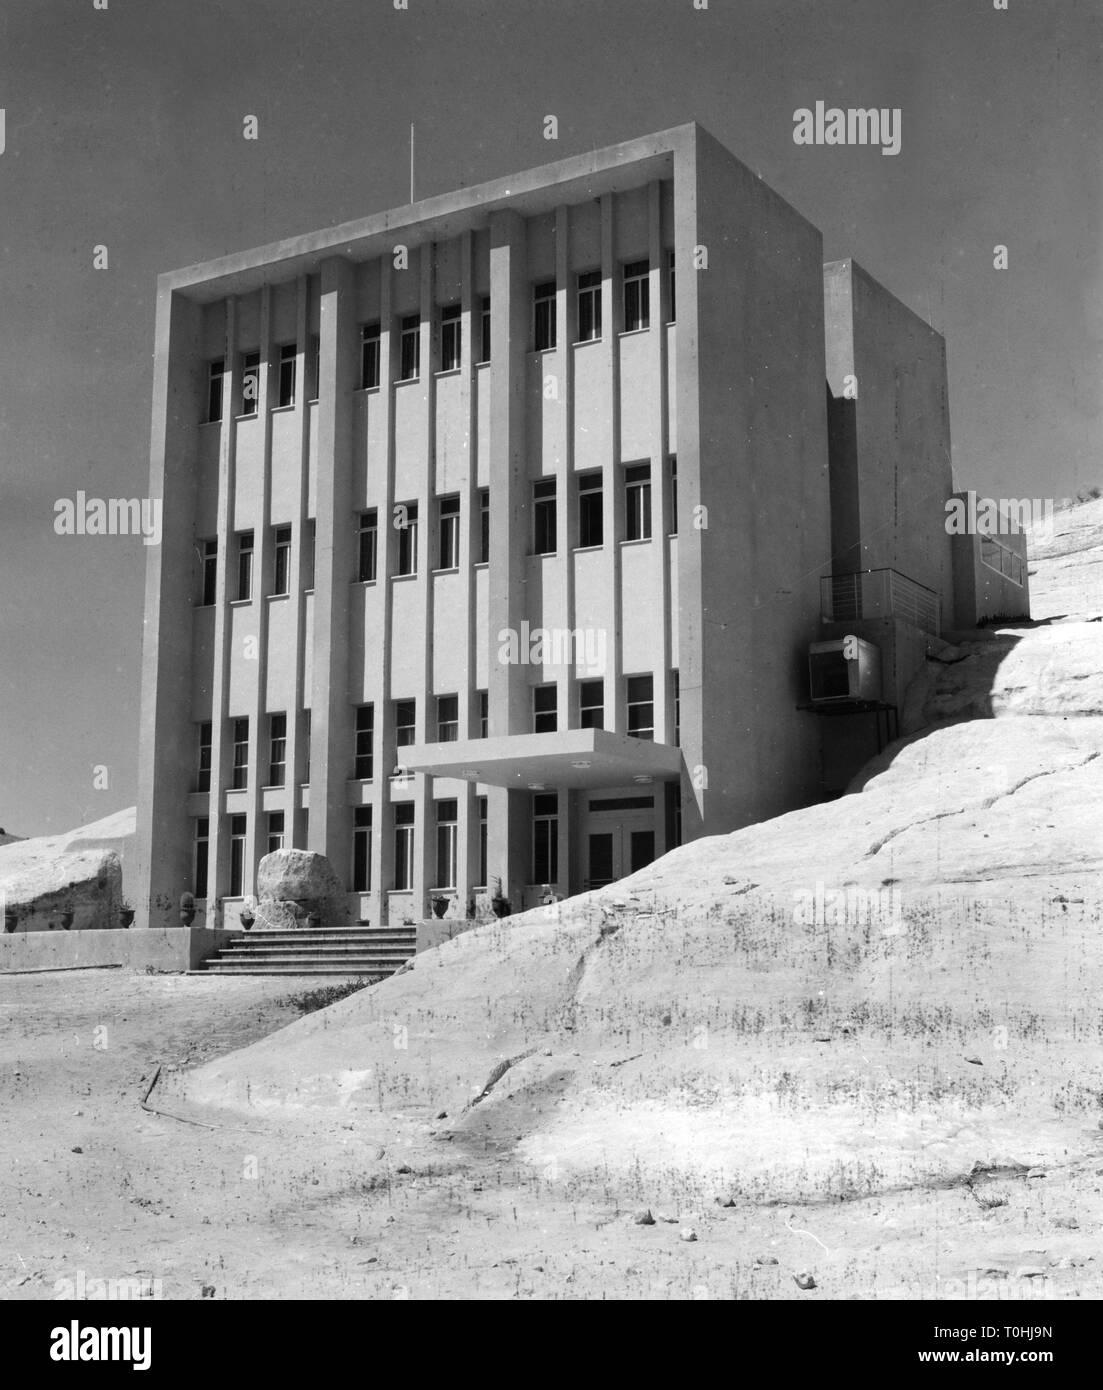 Geographie/Reisen, Jordanien, Petra, Rest House, Außenansicht, 1965, Additional-Rights - Clearance-Info - Not-Available Stockbild